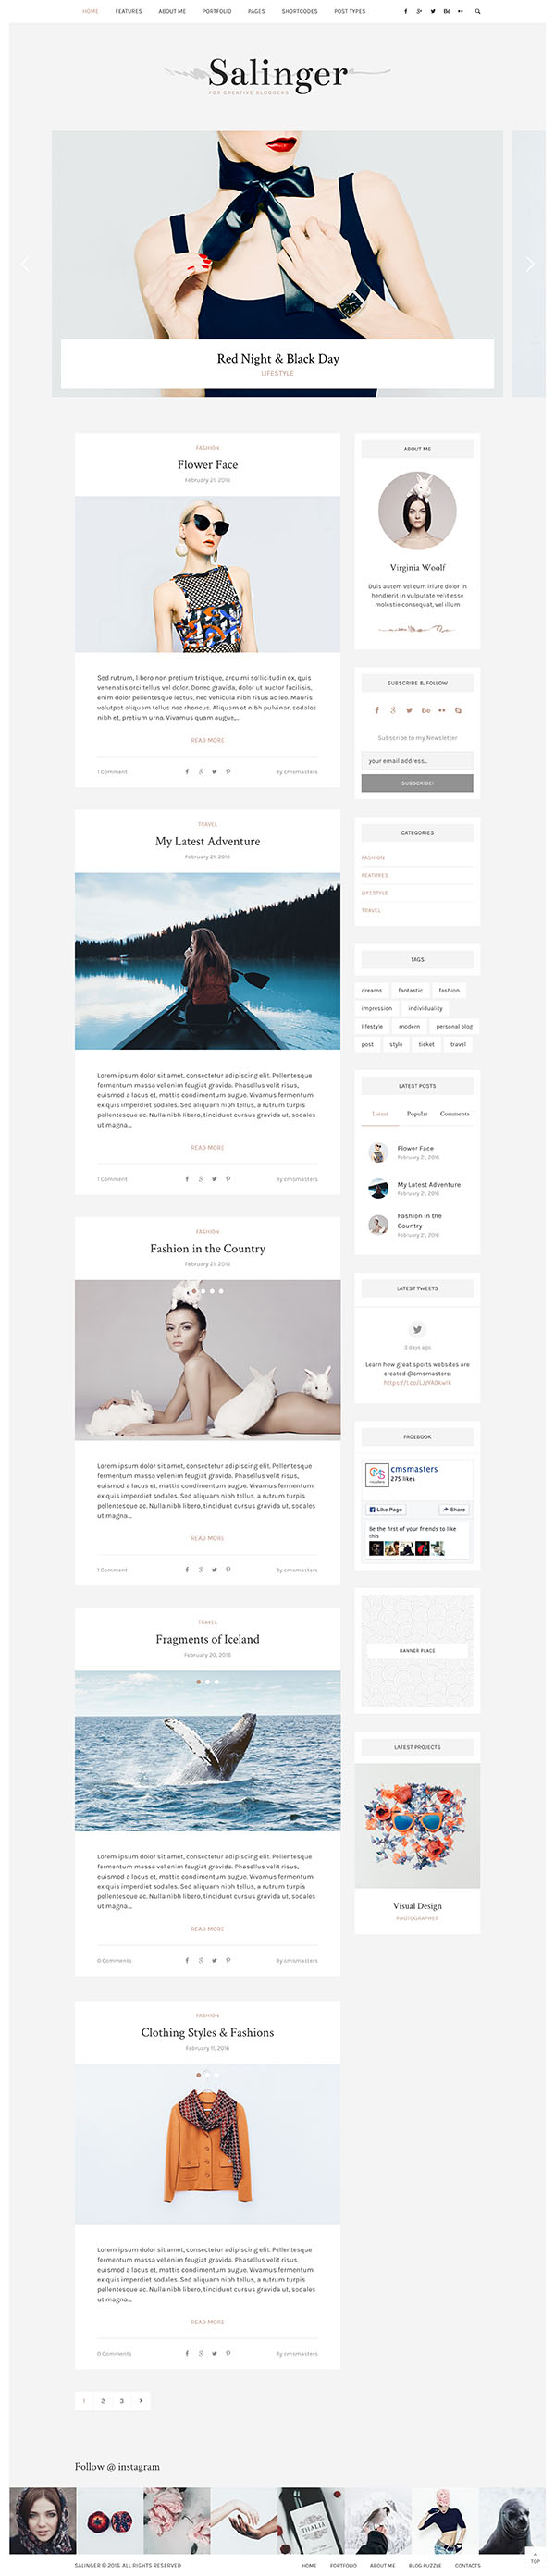 13 Salinger - Personal Blog & Portfolio WordPress Theme